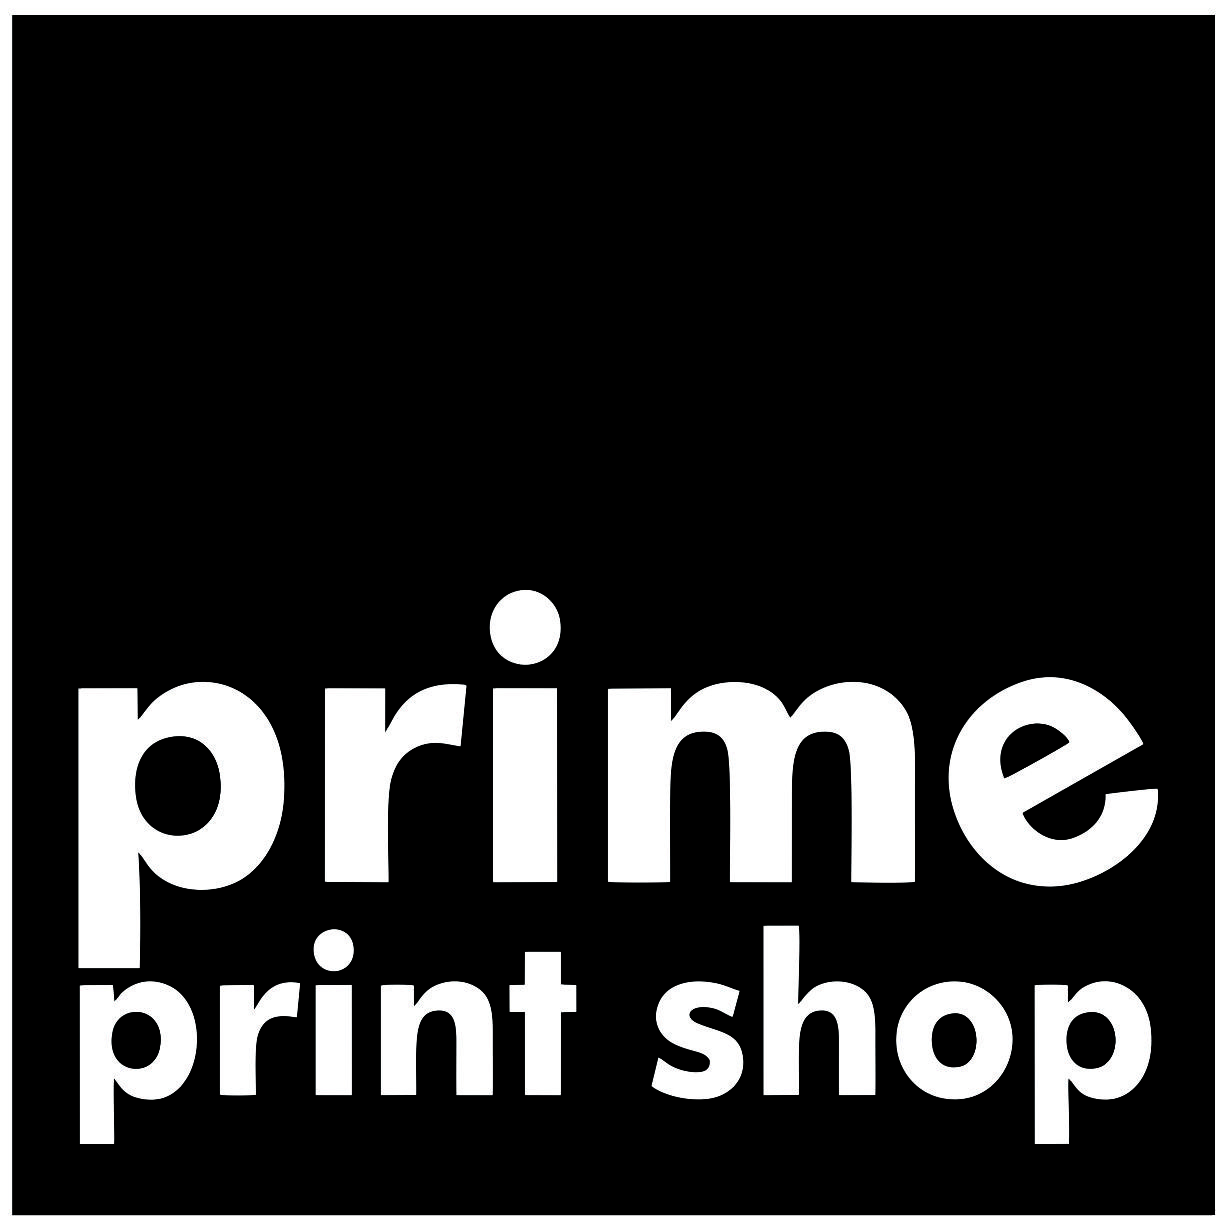 Prime Print Shop